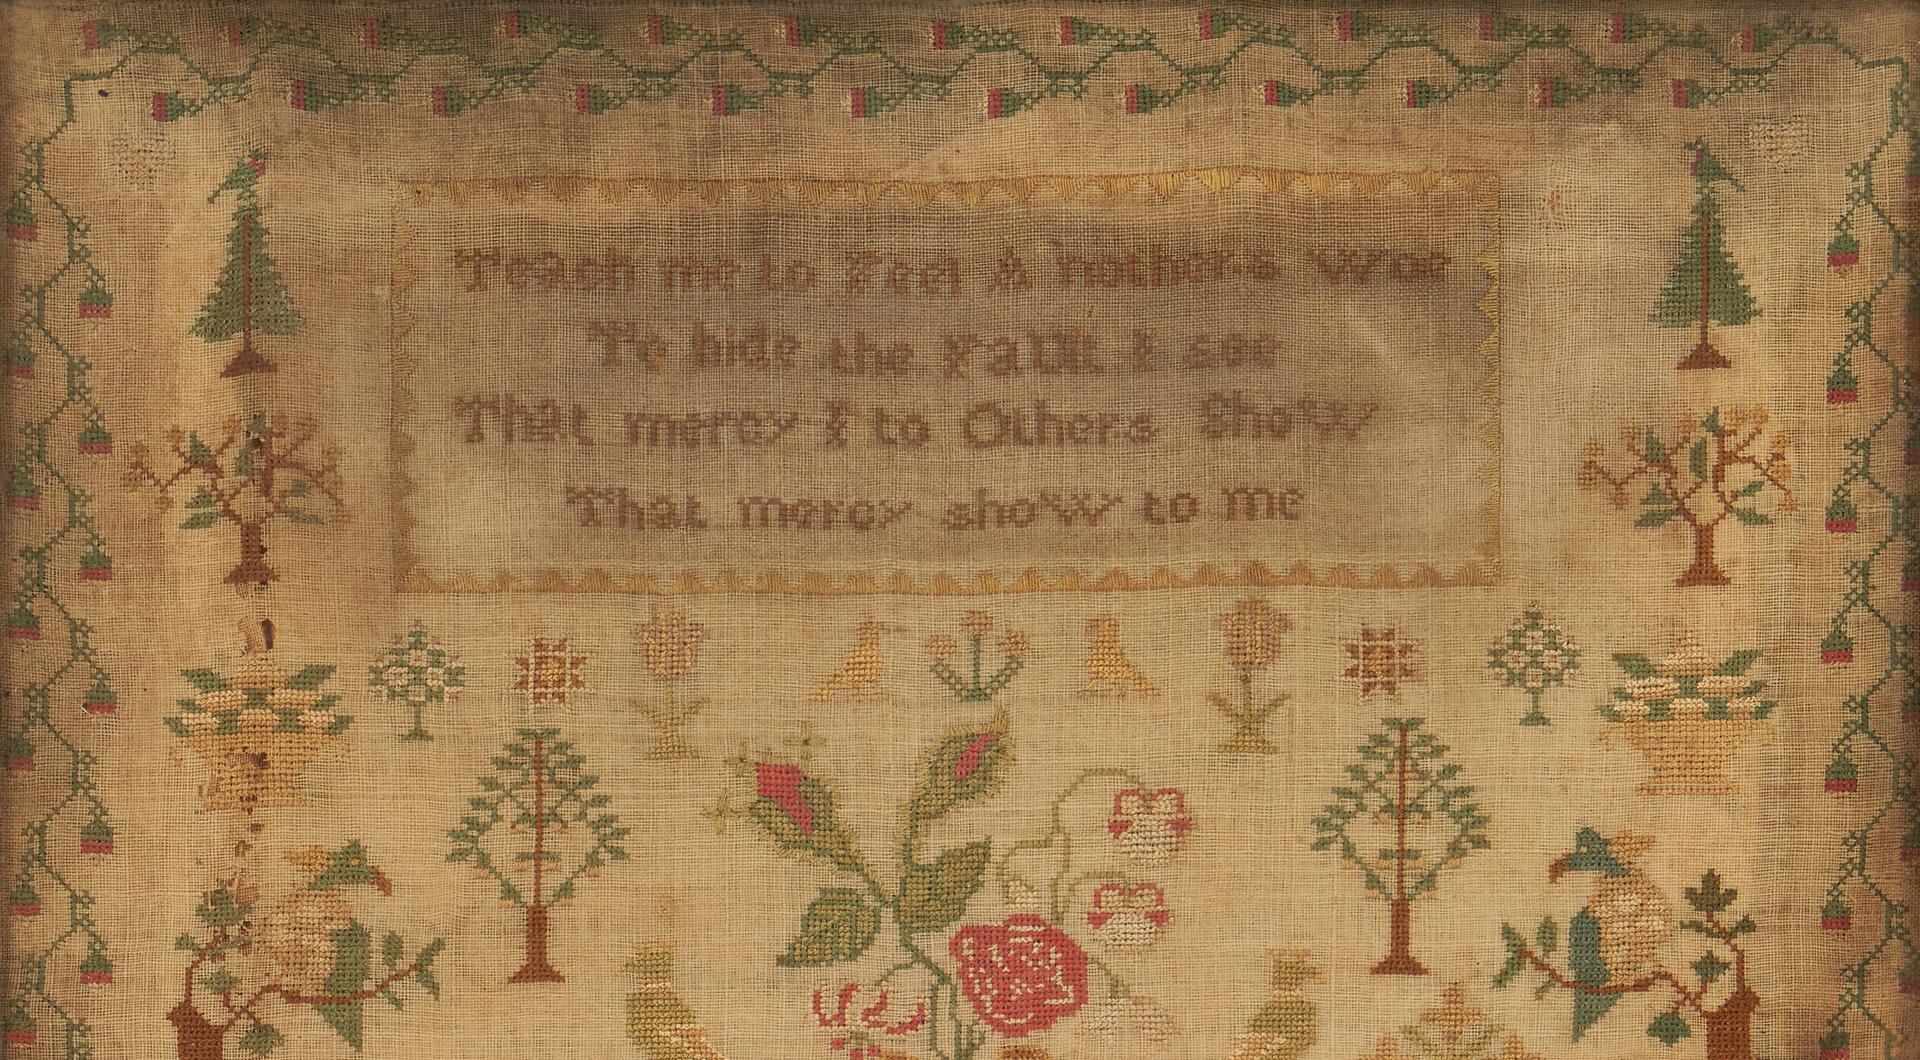 Lot 1059: 1824 House Sampler, Caroline Hayward